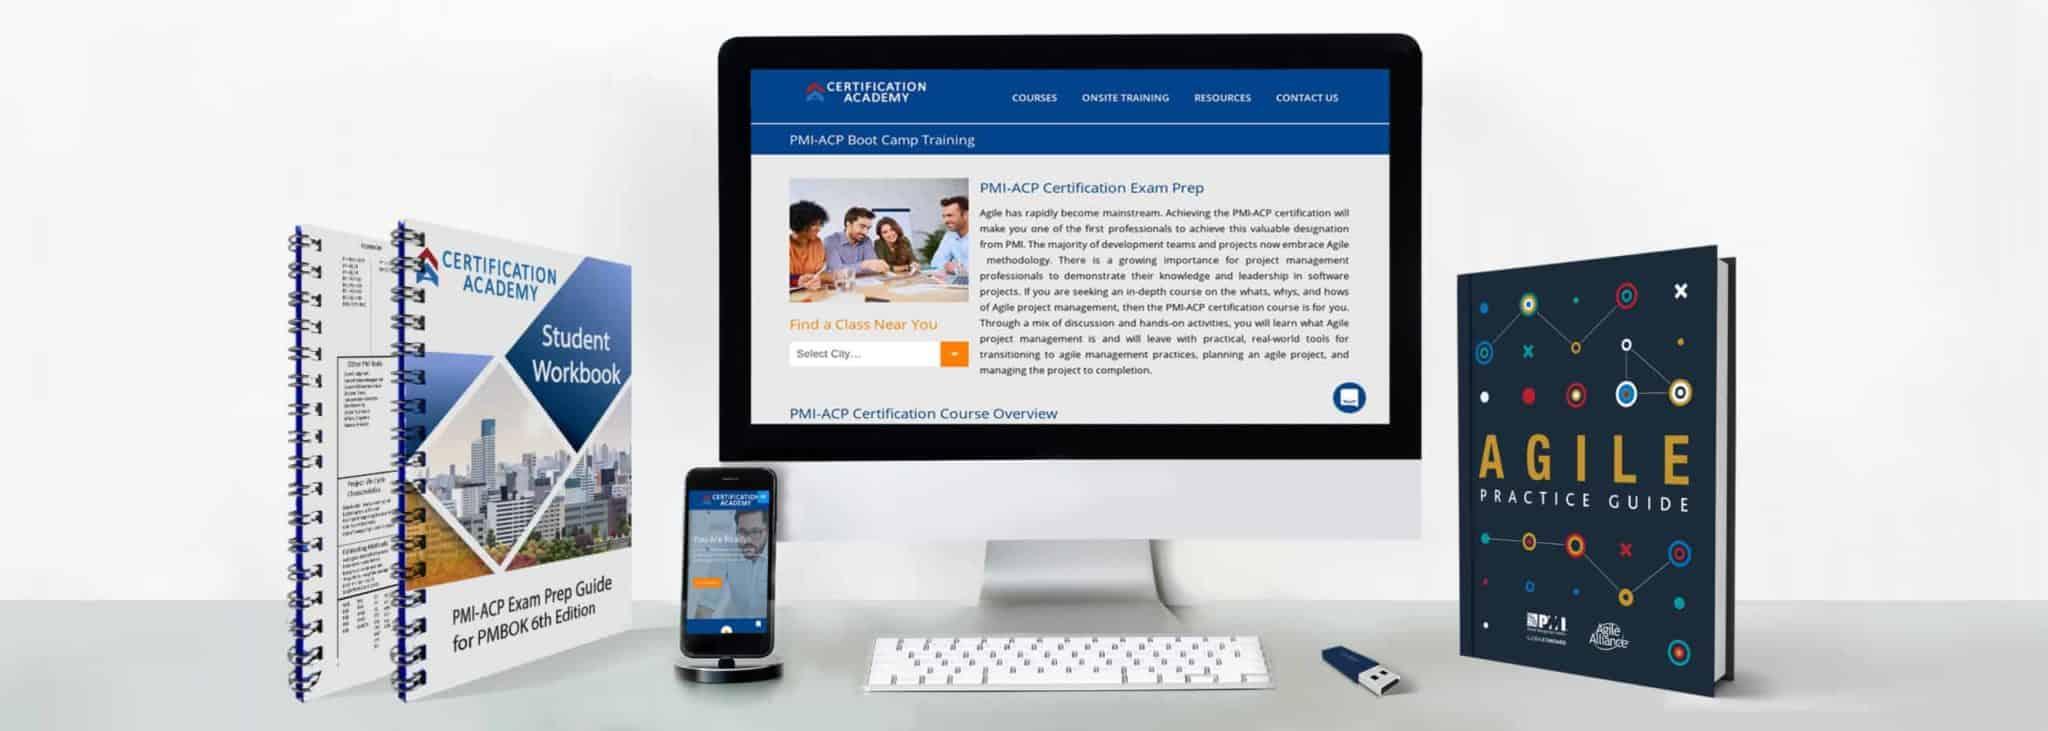 pmi-acp certification training materials